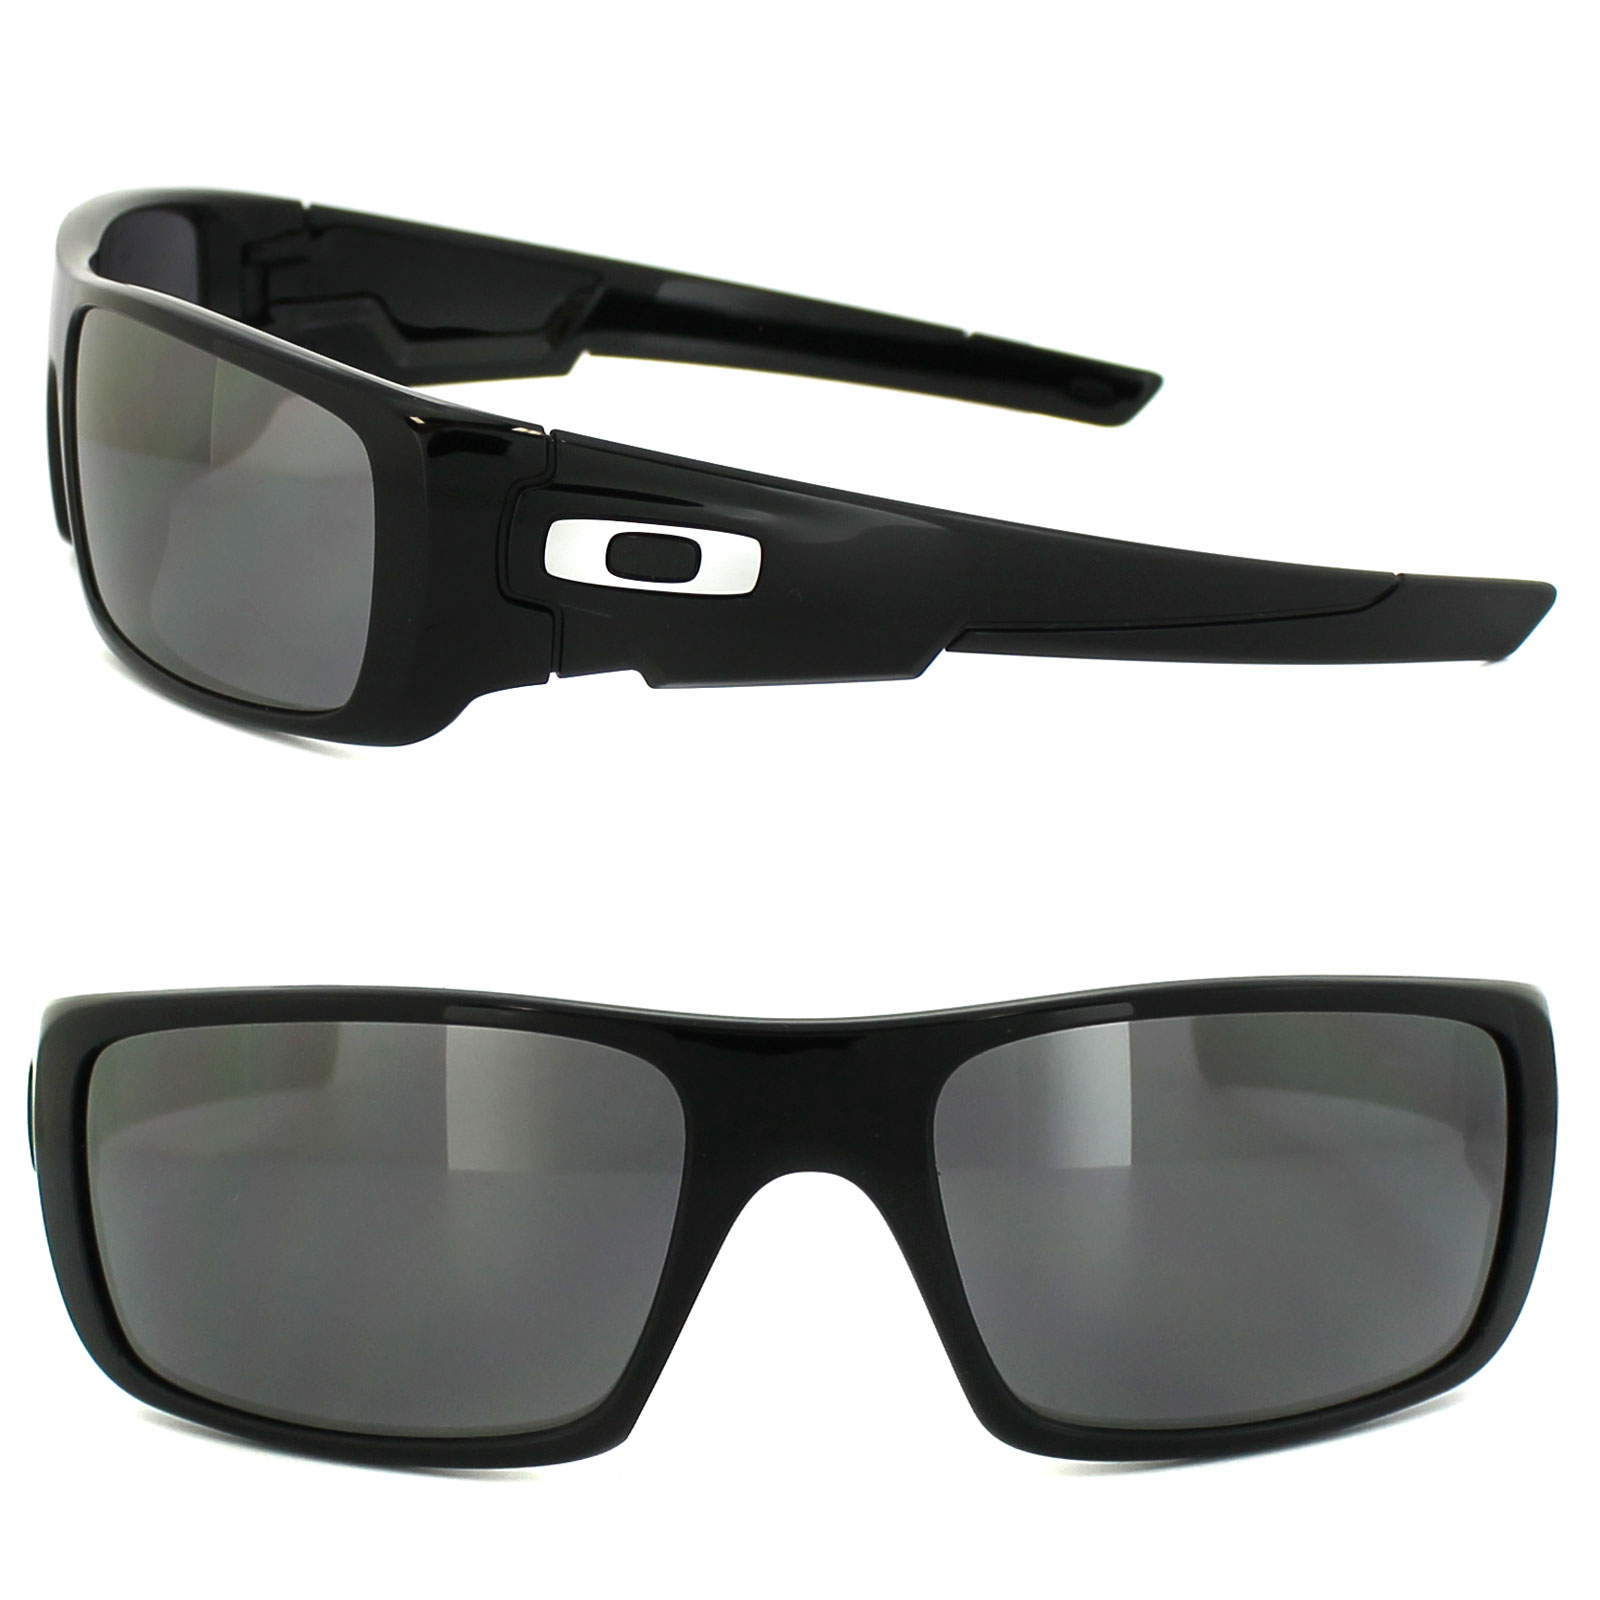 Cheap Oakley Crankshaft Sunglasses Discounted Sunglasses